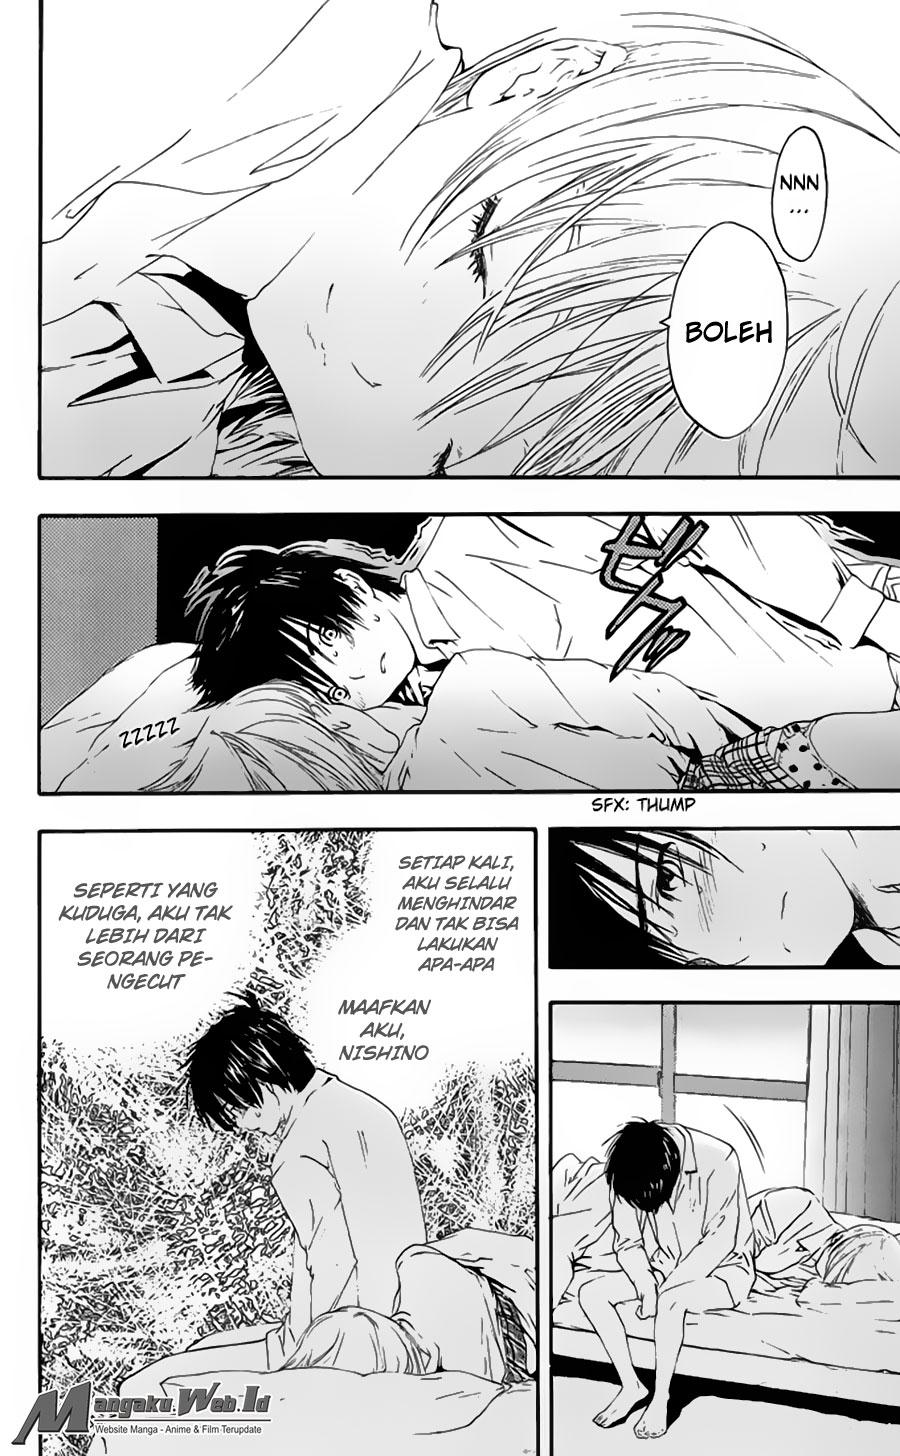 Dilarang COPAS - situs resmi www.mangacanblog.com - Komik ichigo 100 112 - chapter 112 113 Indonesia ichigo 100 112 - chapter 112 Terbaru 14|Baca Manga Komik Indonesia|Mangacan